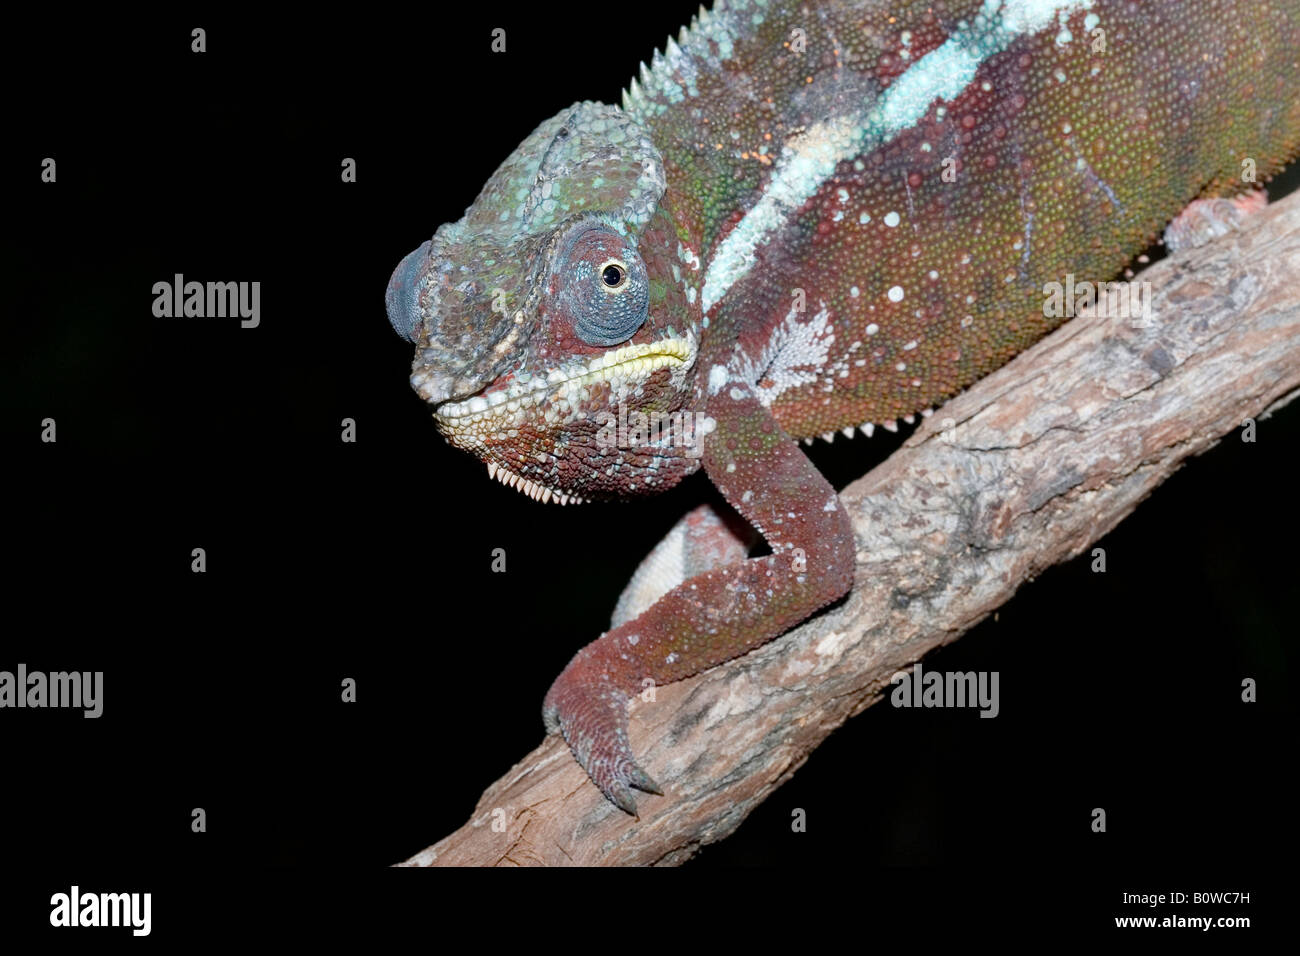 Männliche Pantherchamäleon (Furcifer Pardalis), natürliche Farbe, Madagaskar, Afrika Stockbild